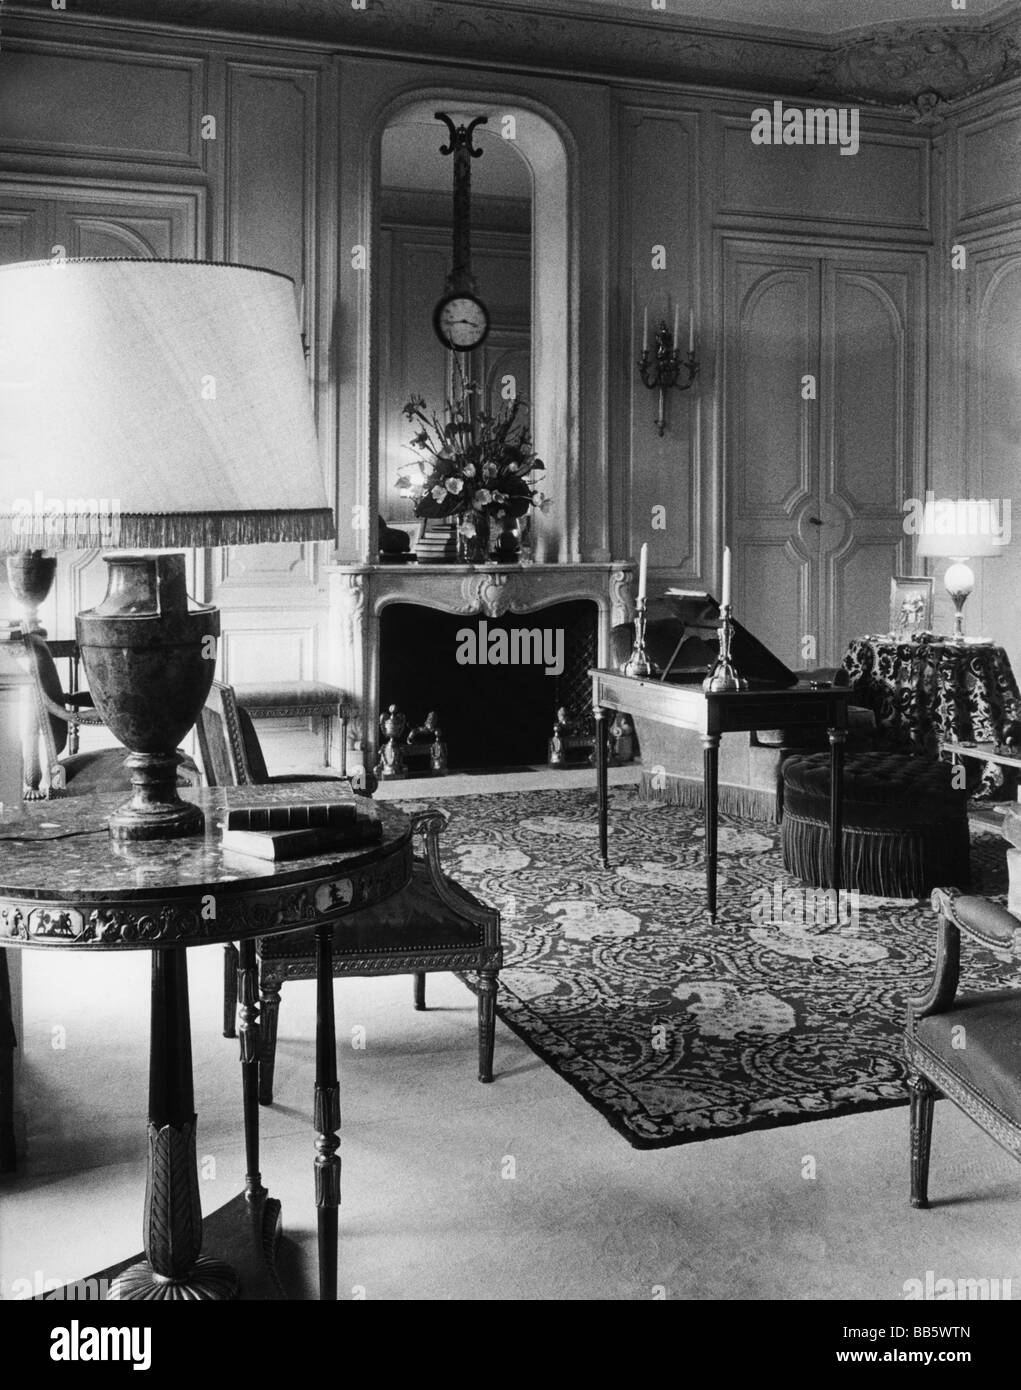 interior design 1950s salon 50s historic historical flat